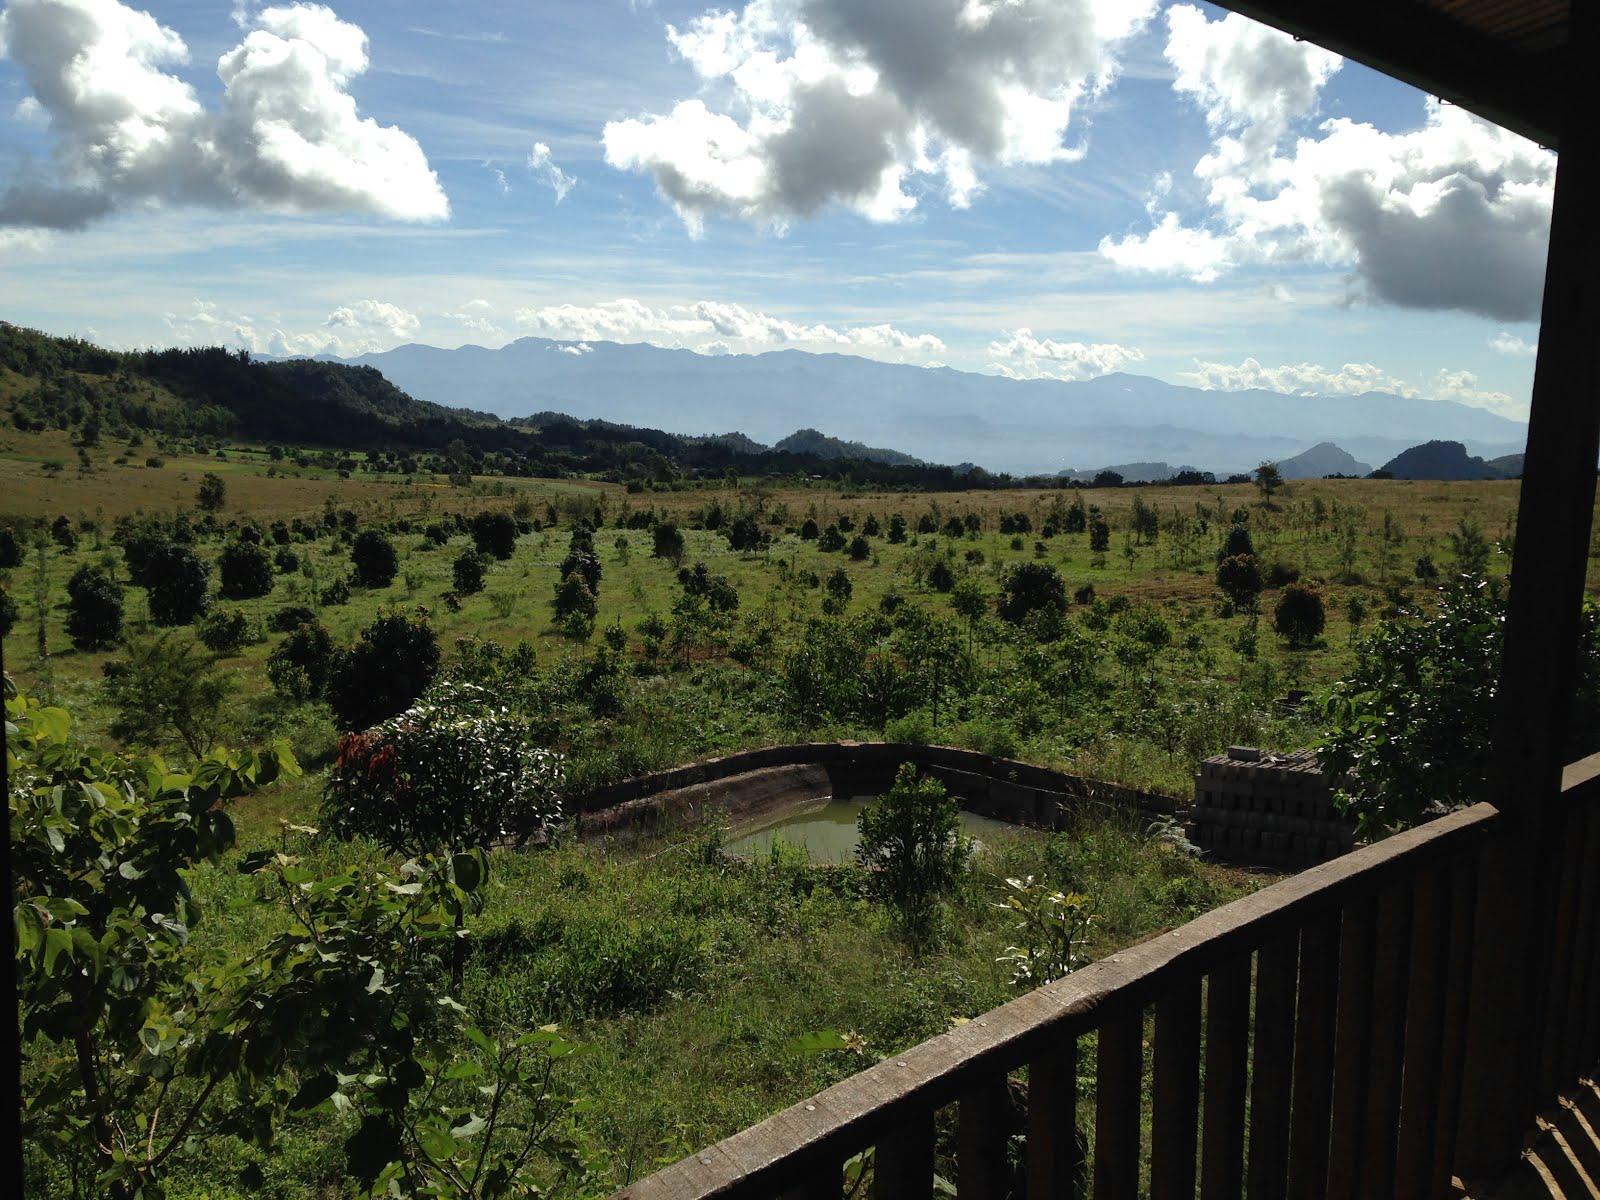 Avocado orchards, Pakhone Village